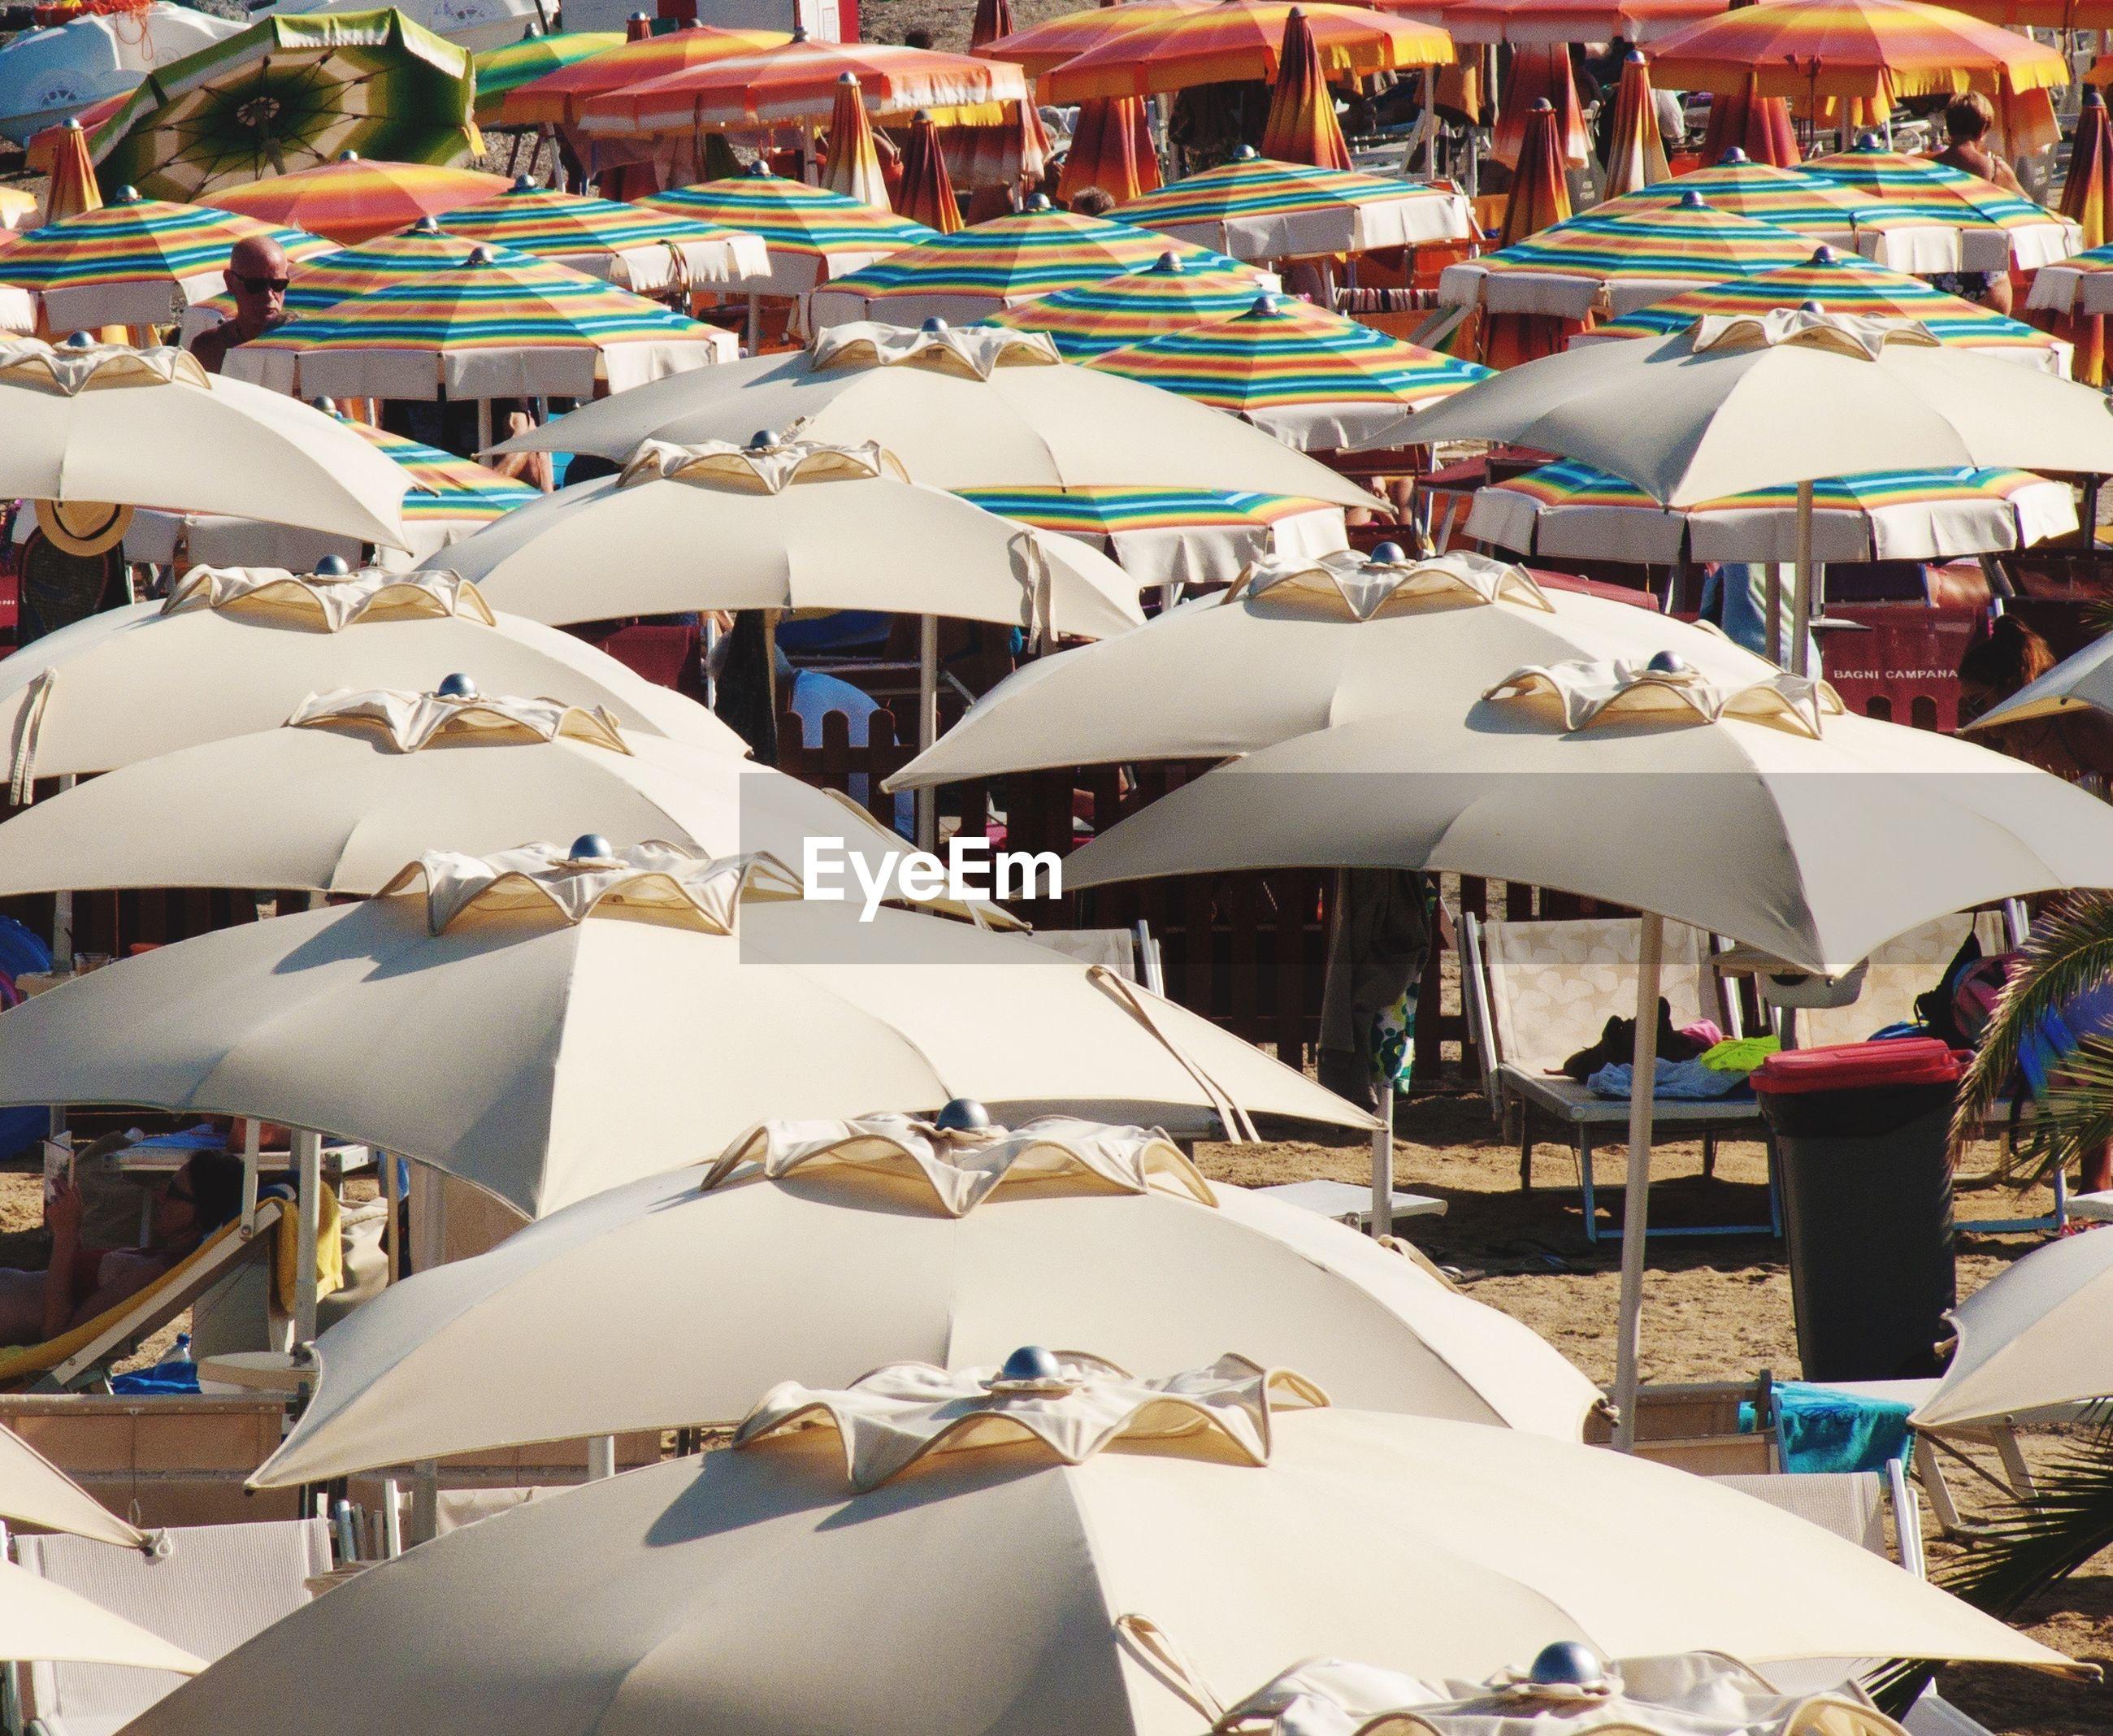 View of umbrellas on beach